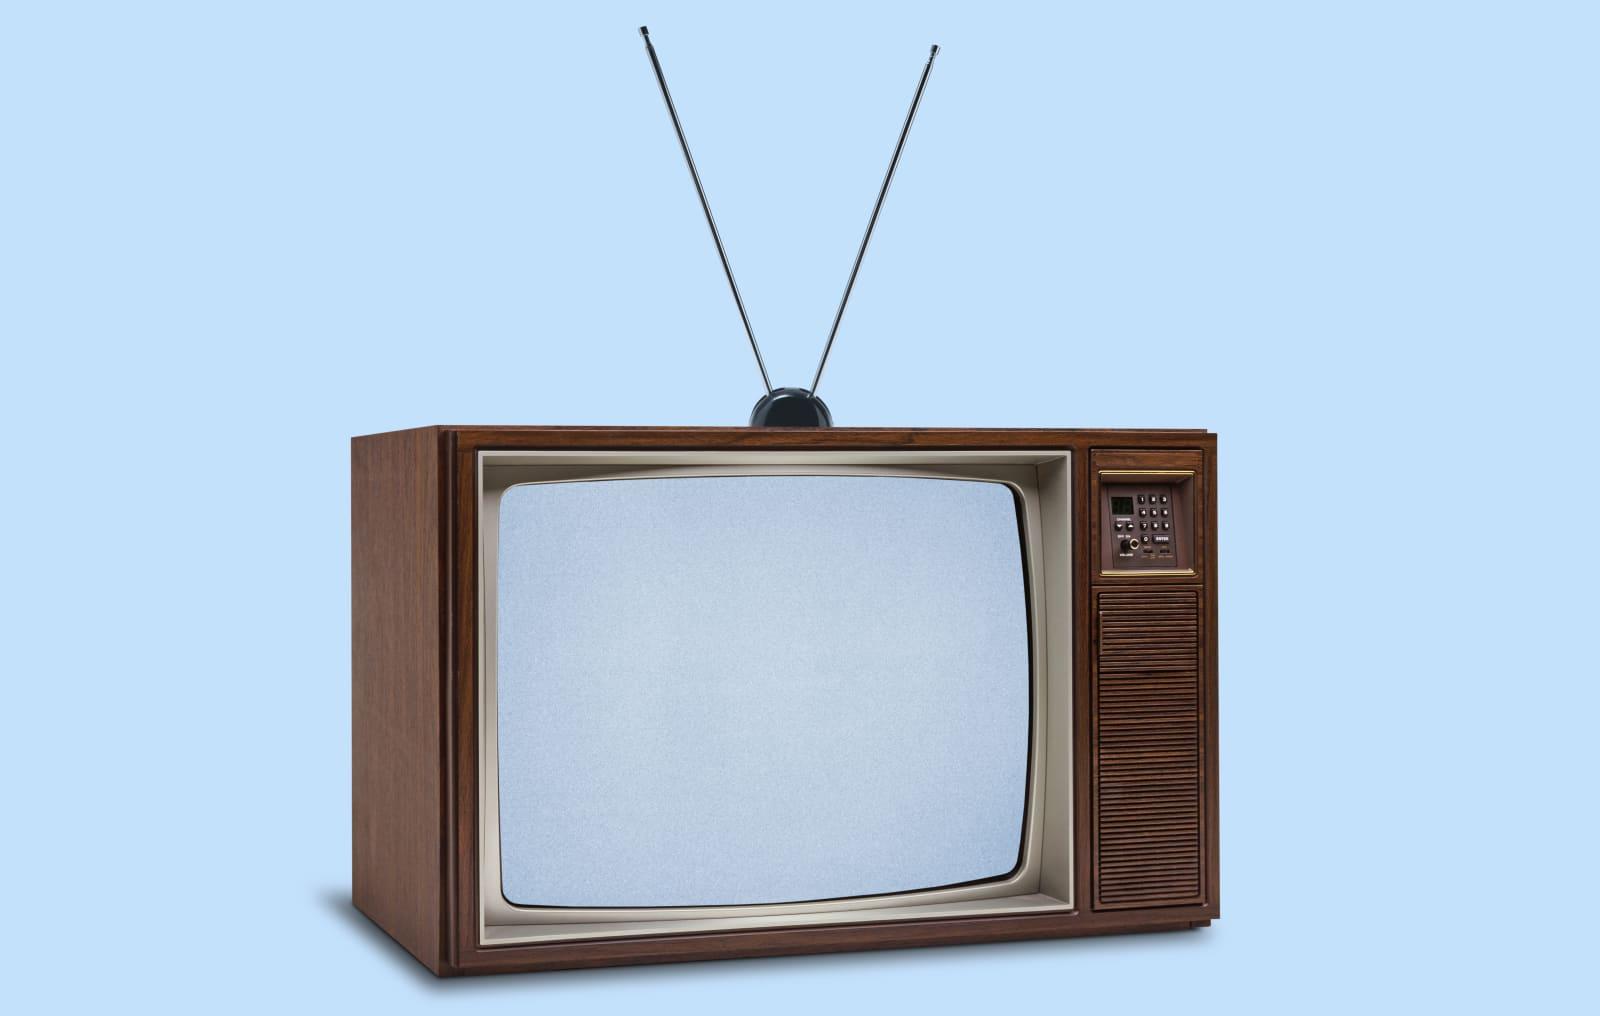 Major broadcasters sue nonprofit TV service over copyright infringement